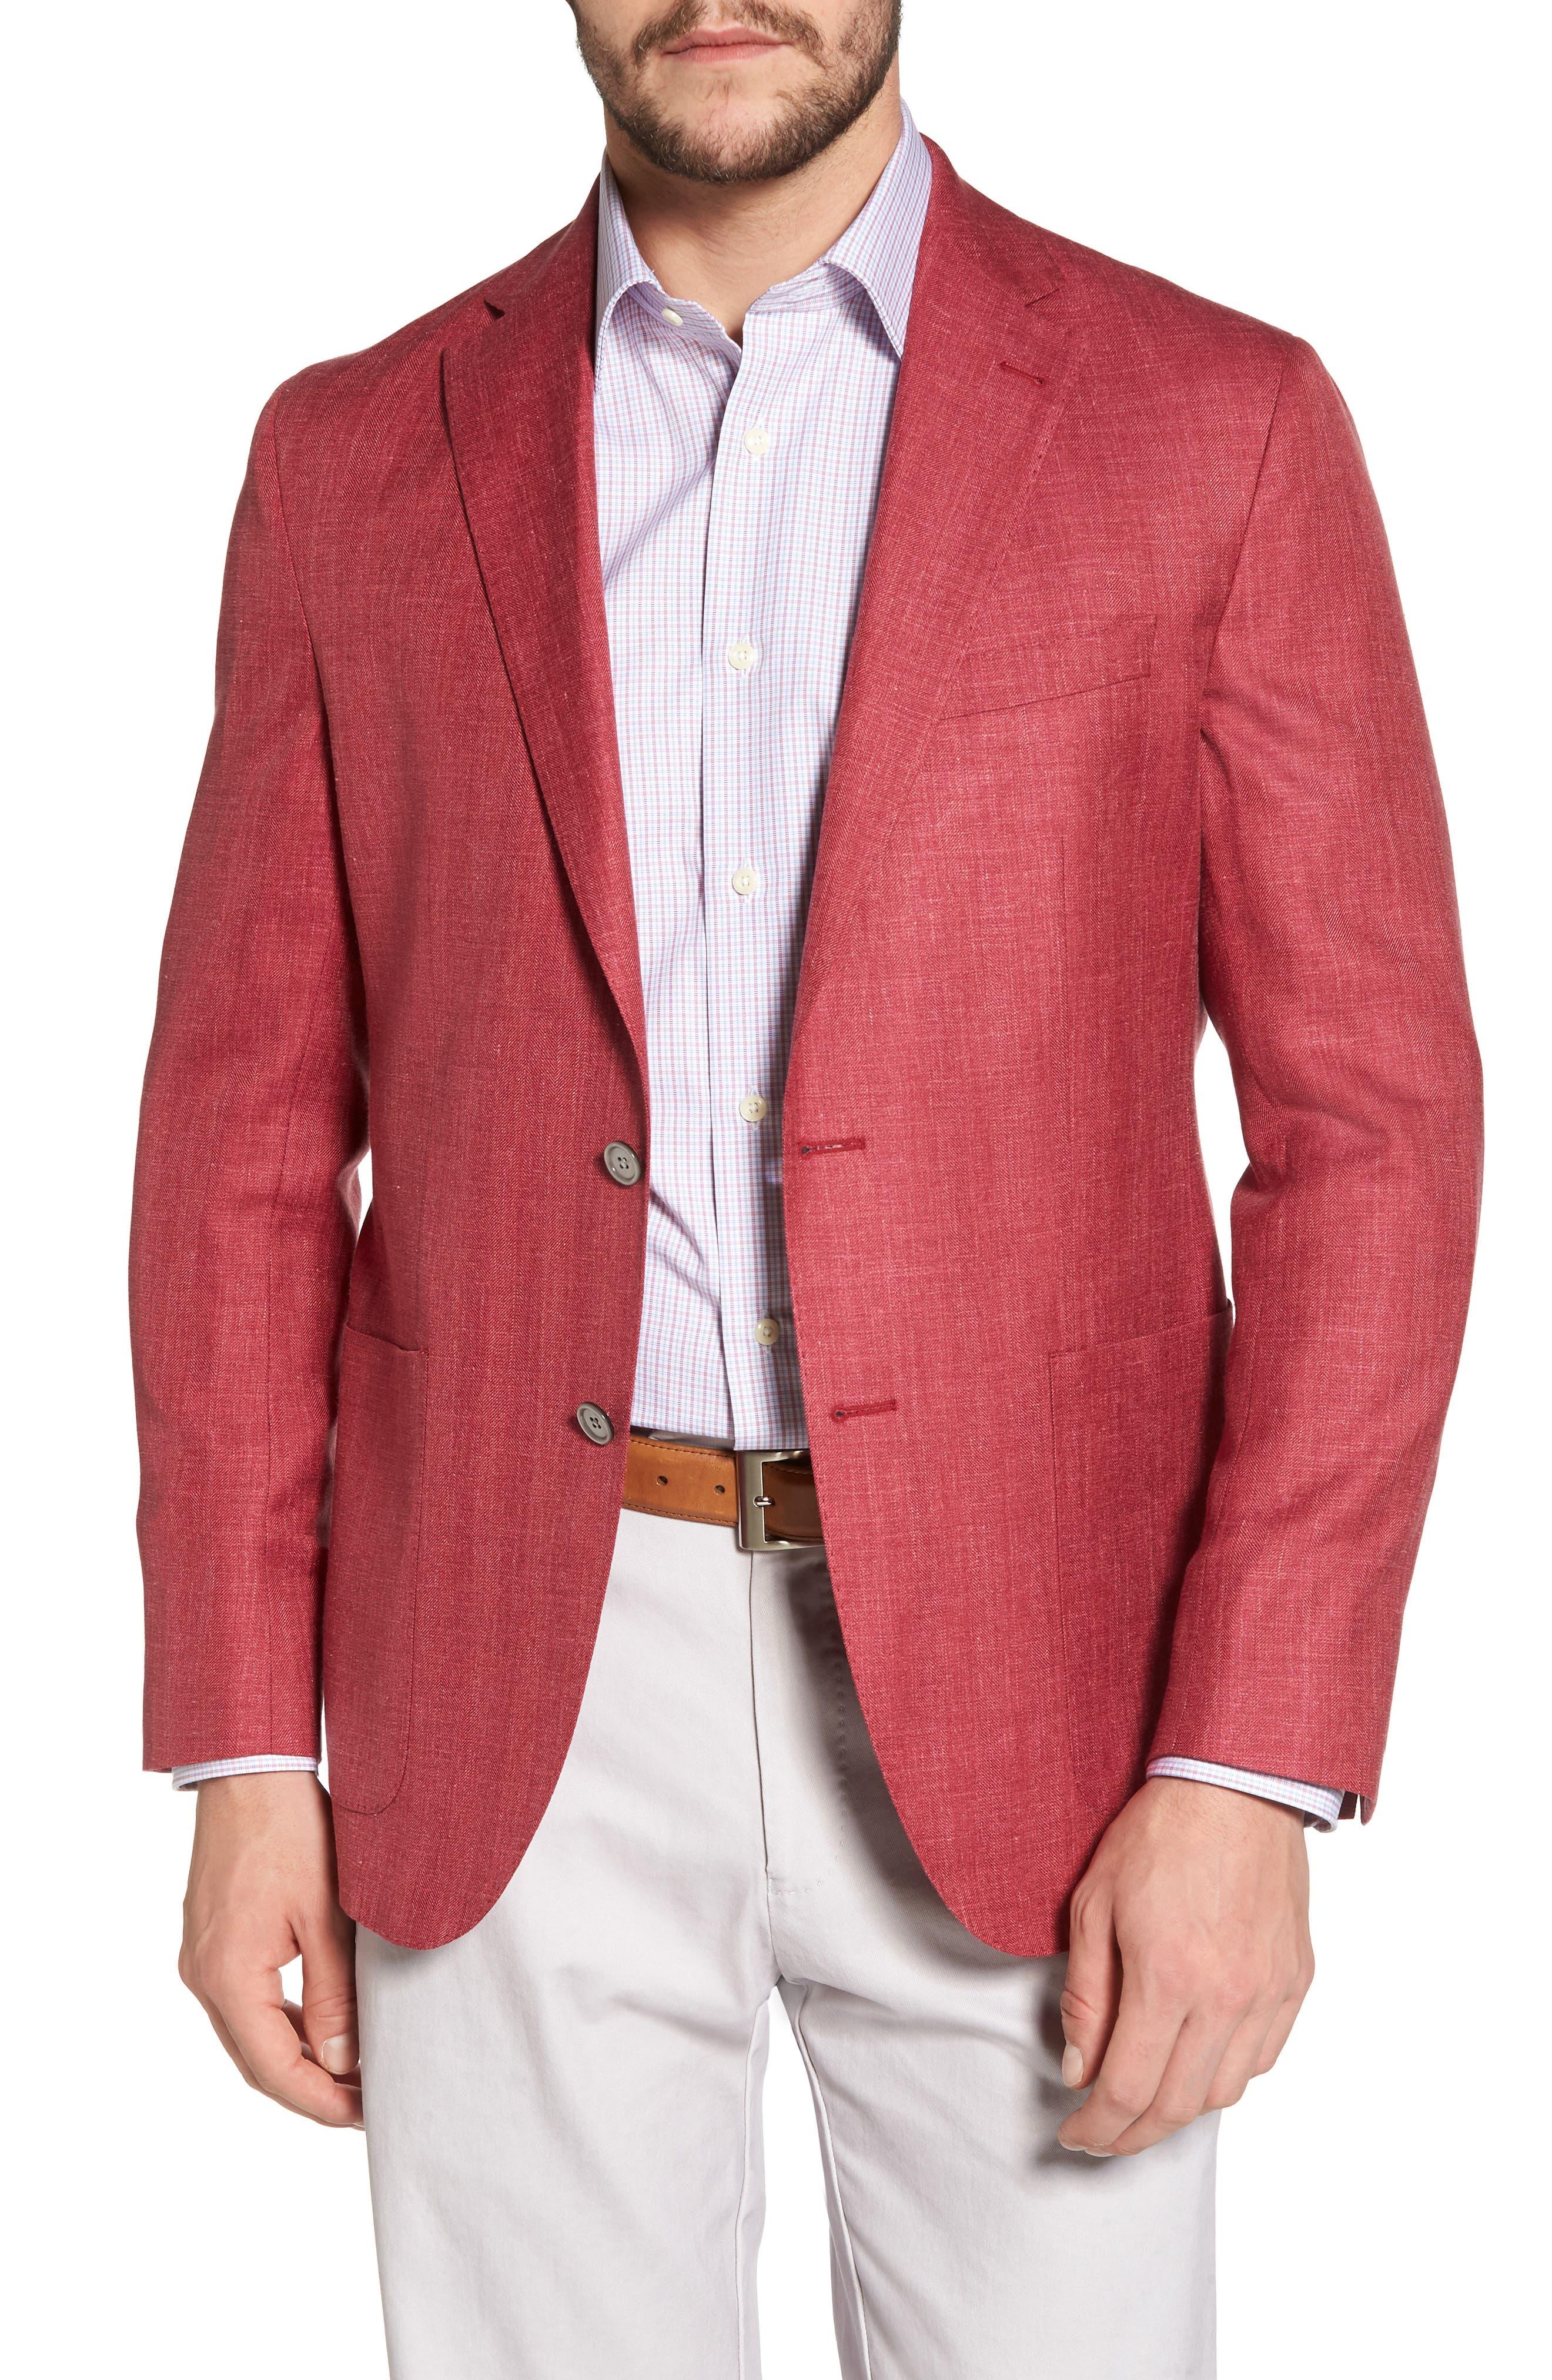 Aiden Classic Fit Wool Blend Blazer,                             Main thumbnail 1, color,                             600